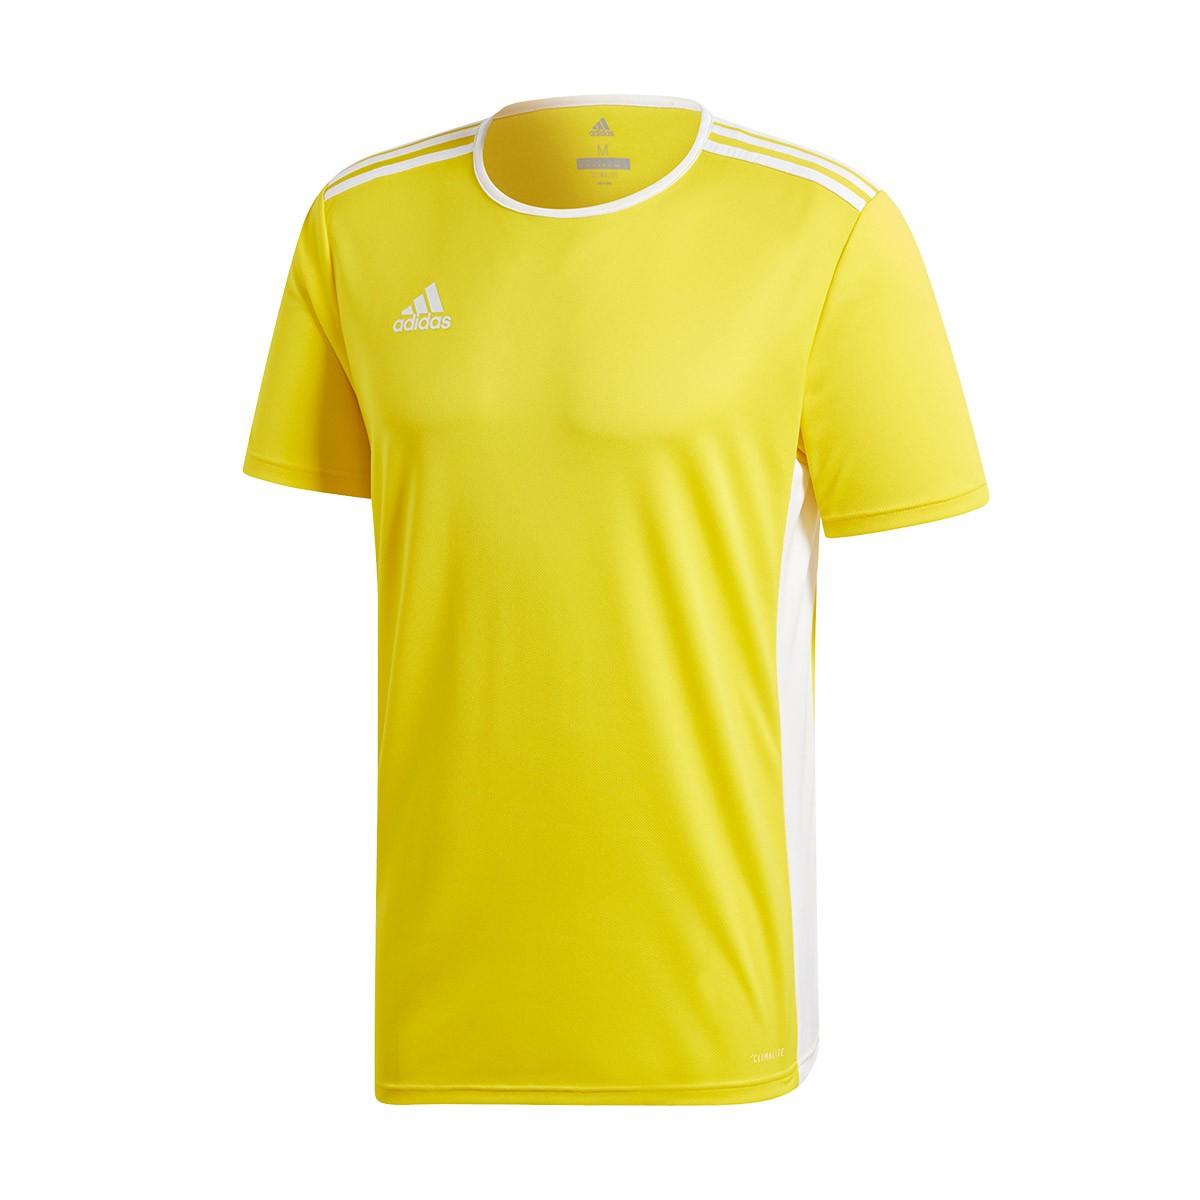 Jersey adidas Entrada 18 m/c Yellow-White - Fútbol Emotion